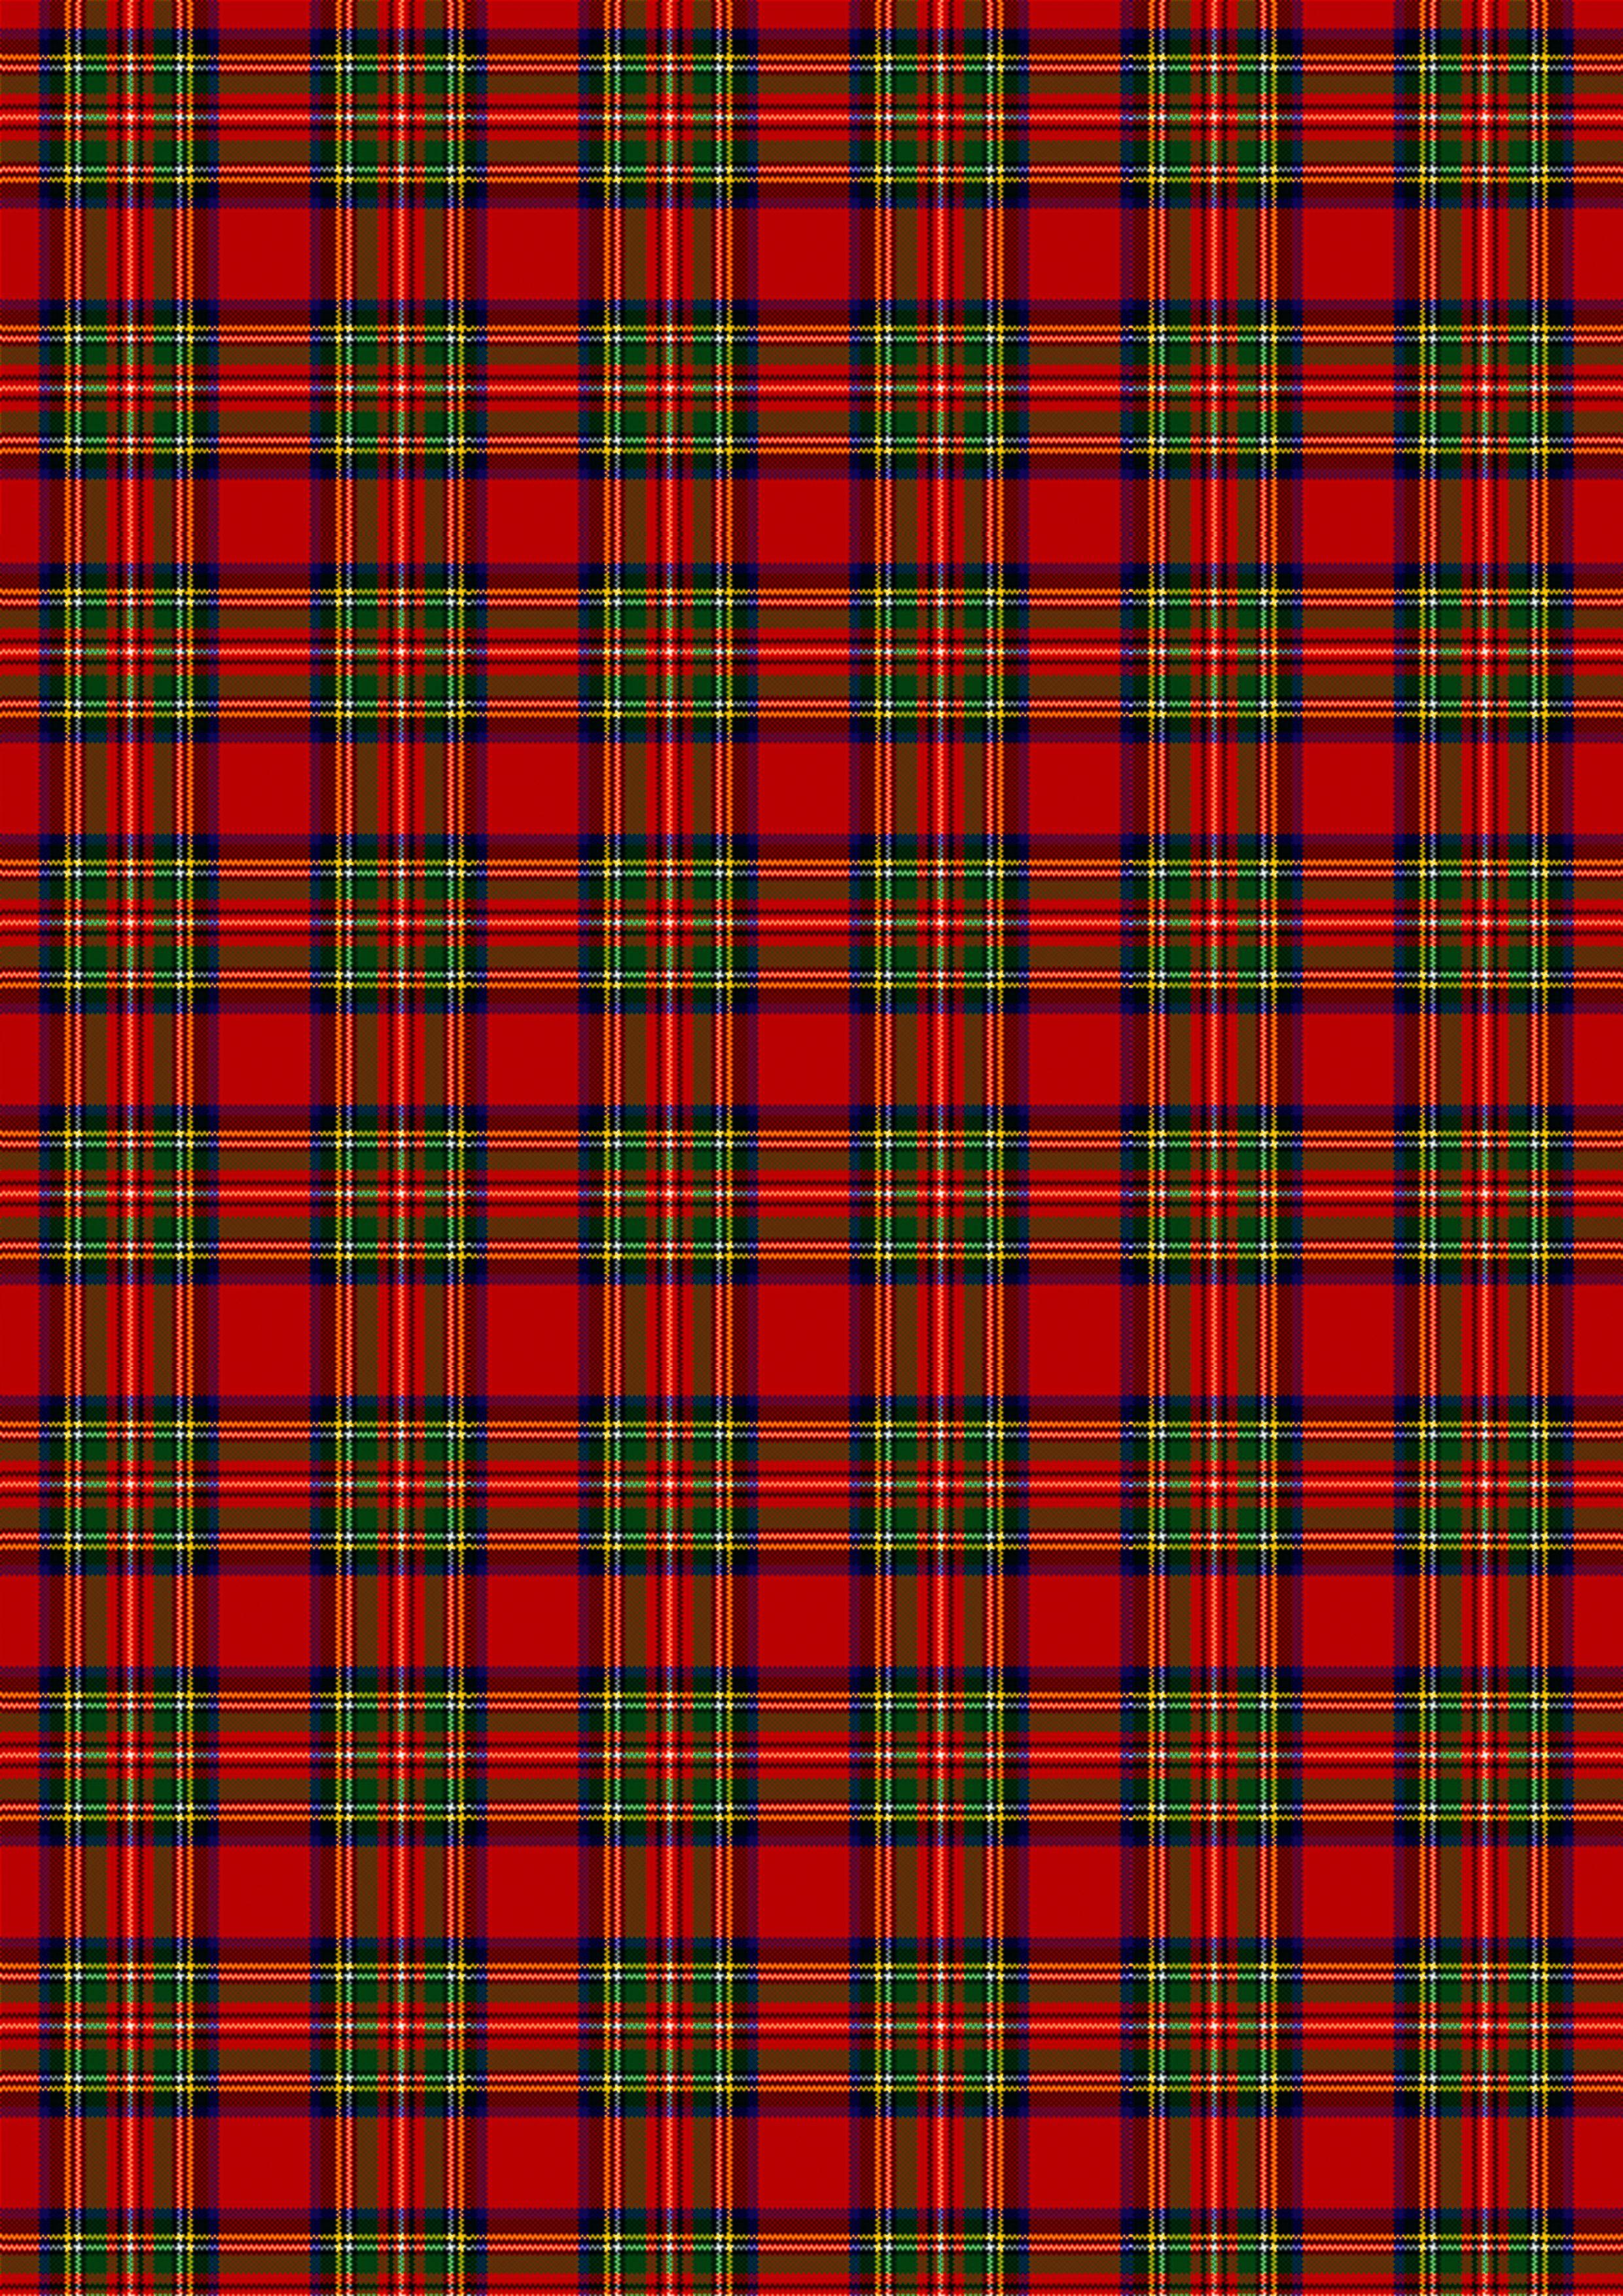 884 Red and green Scottish tartan design 4 Single paper decoupage napkins